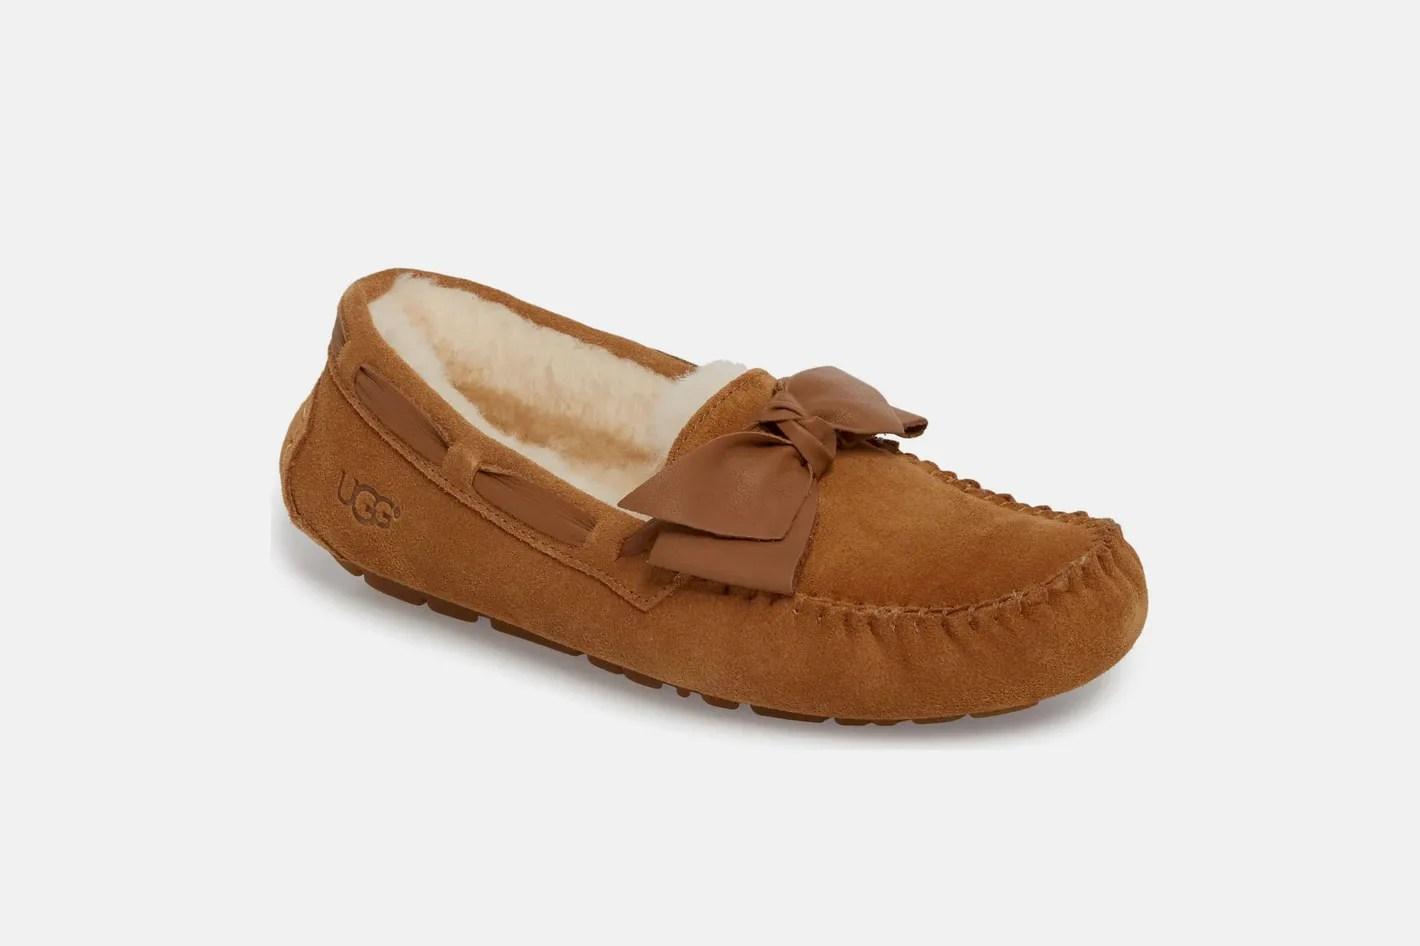 Best Mens Slippers on Amazon Sheepskin Flannel Leather